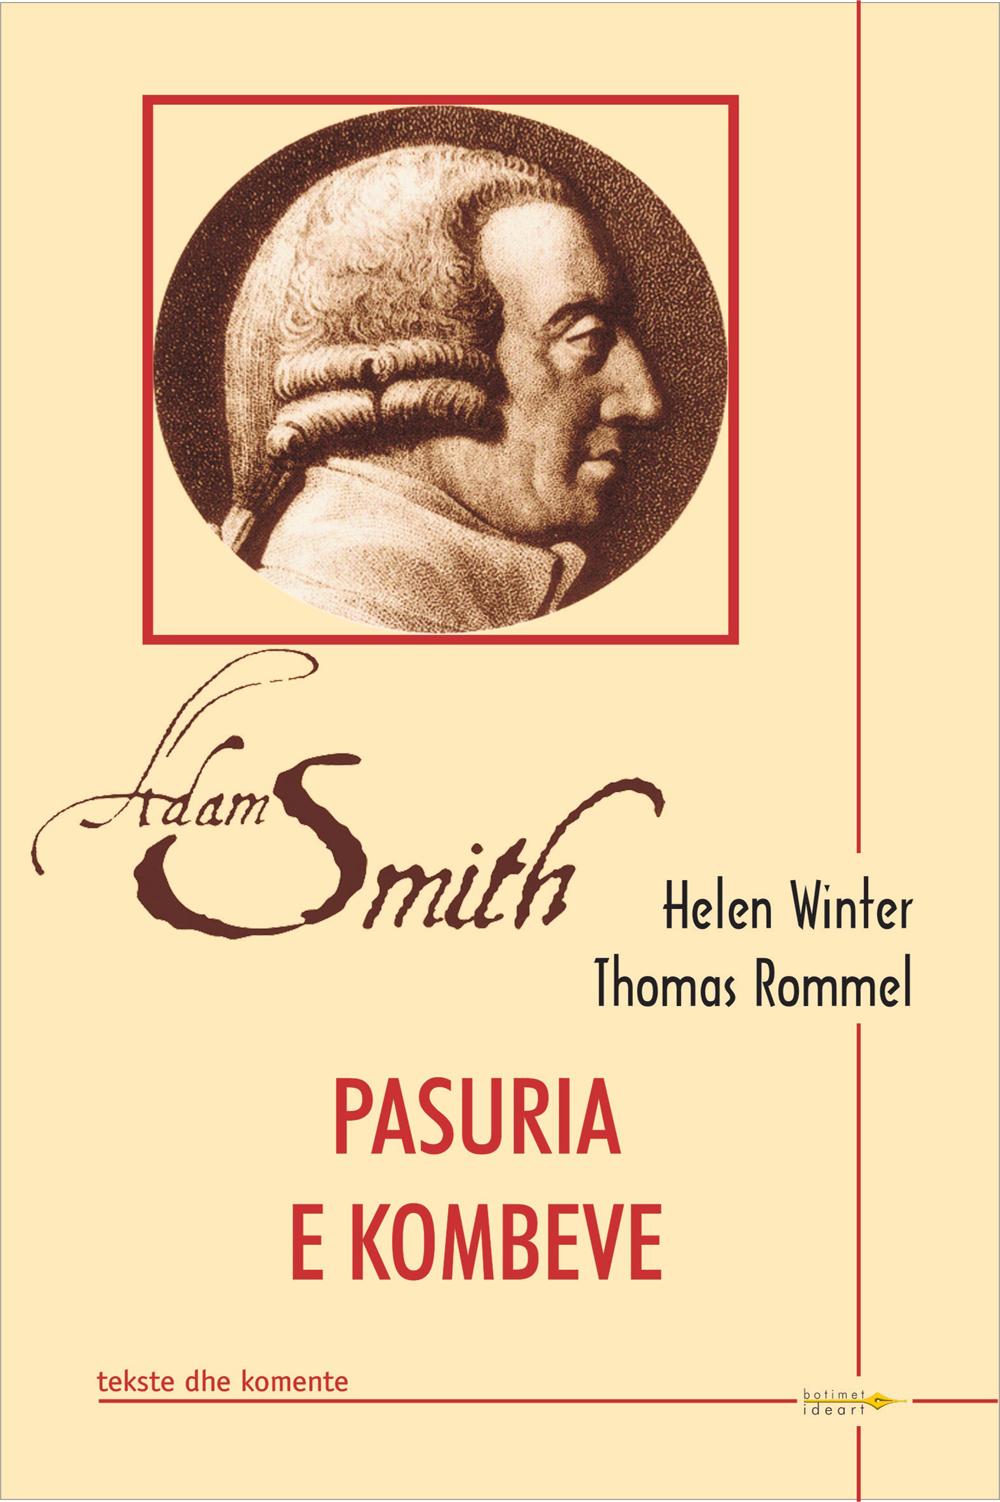 Adam Smith - pasuria e kombeve - tekste dhe komente